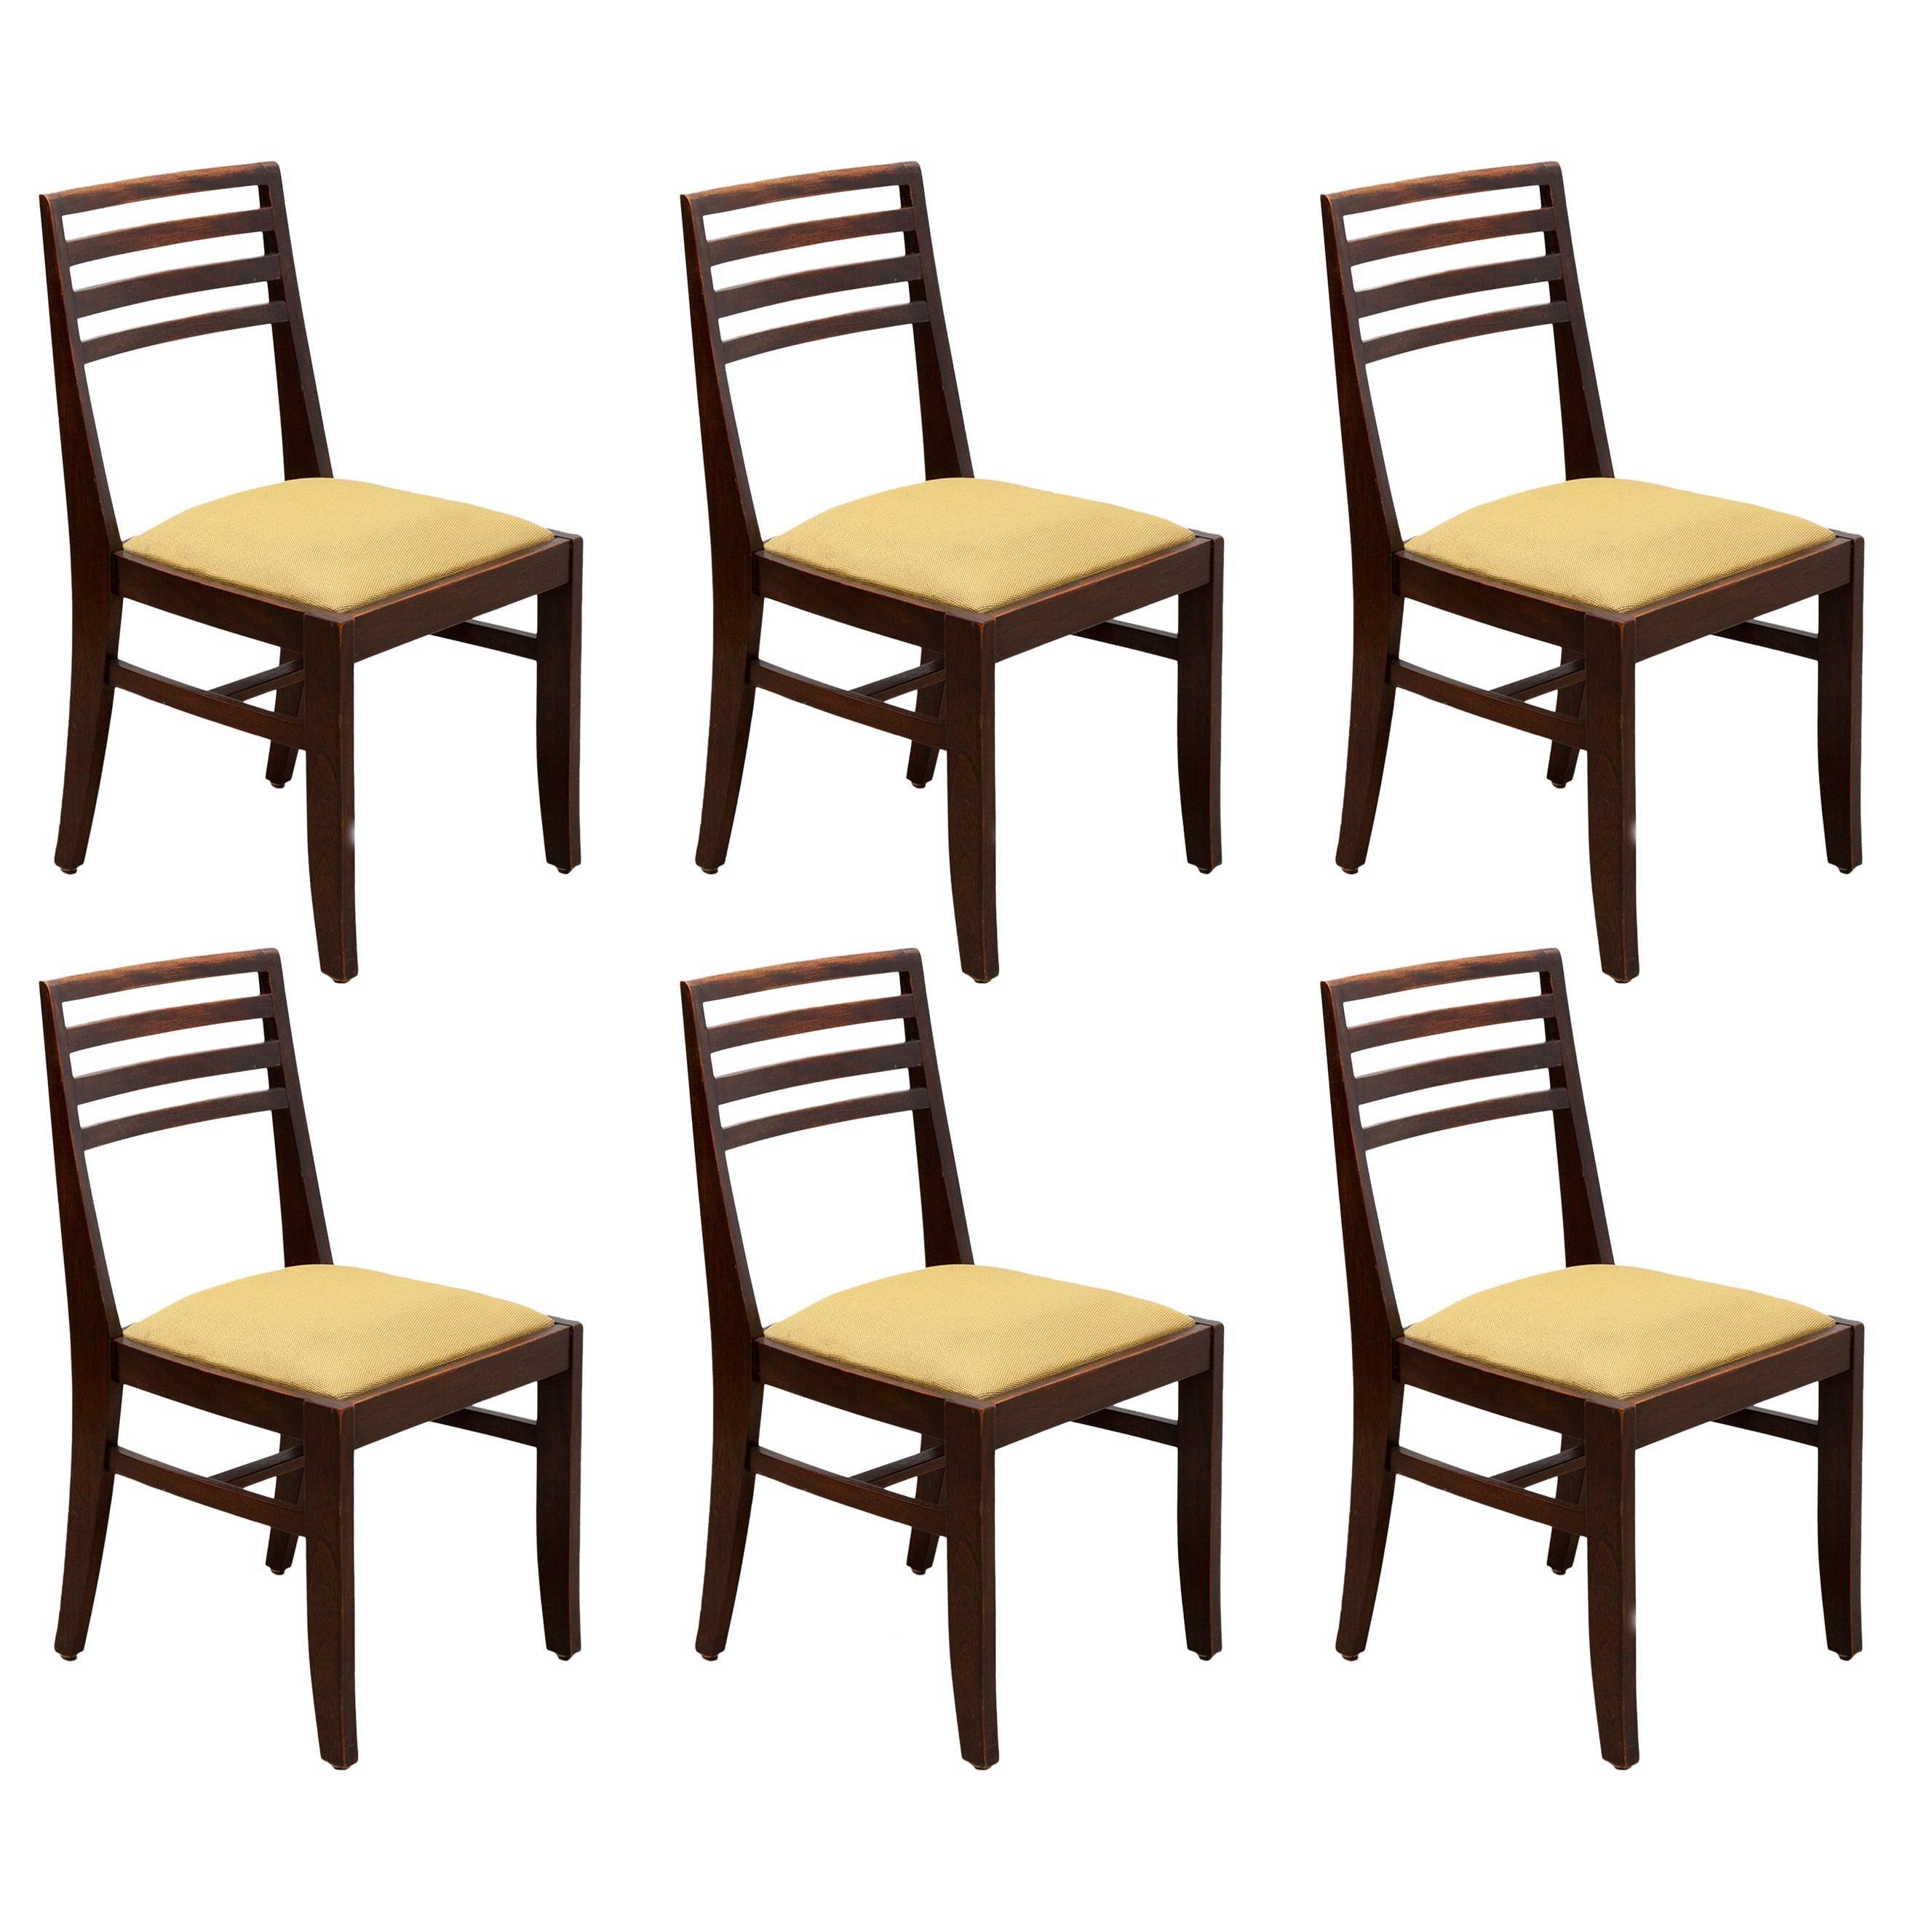 Art Deco Set of Six chairs designed by De Coene, Belgium, 1930s